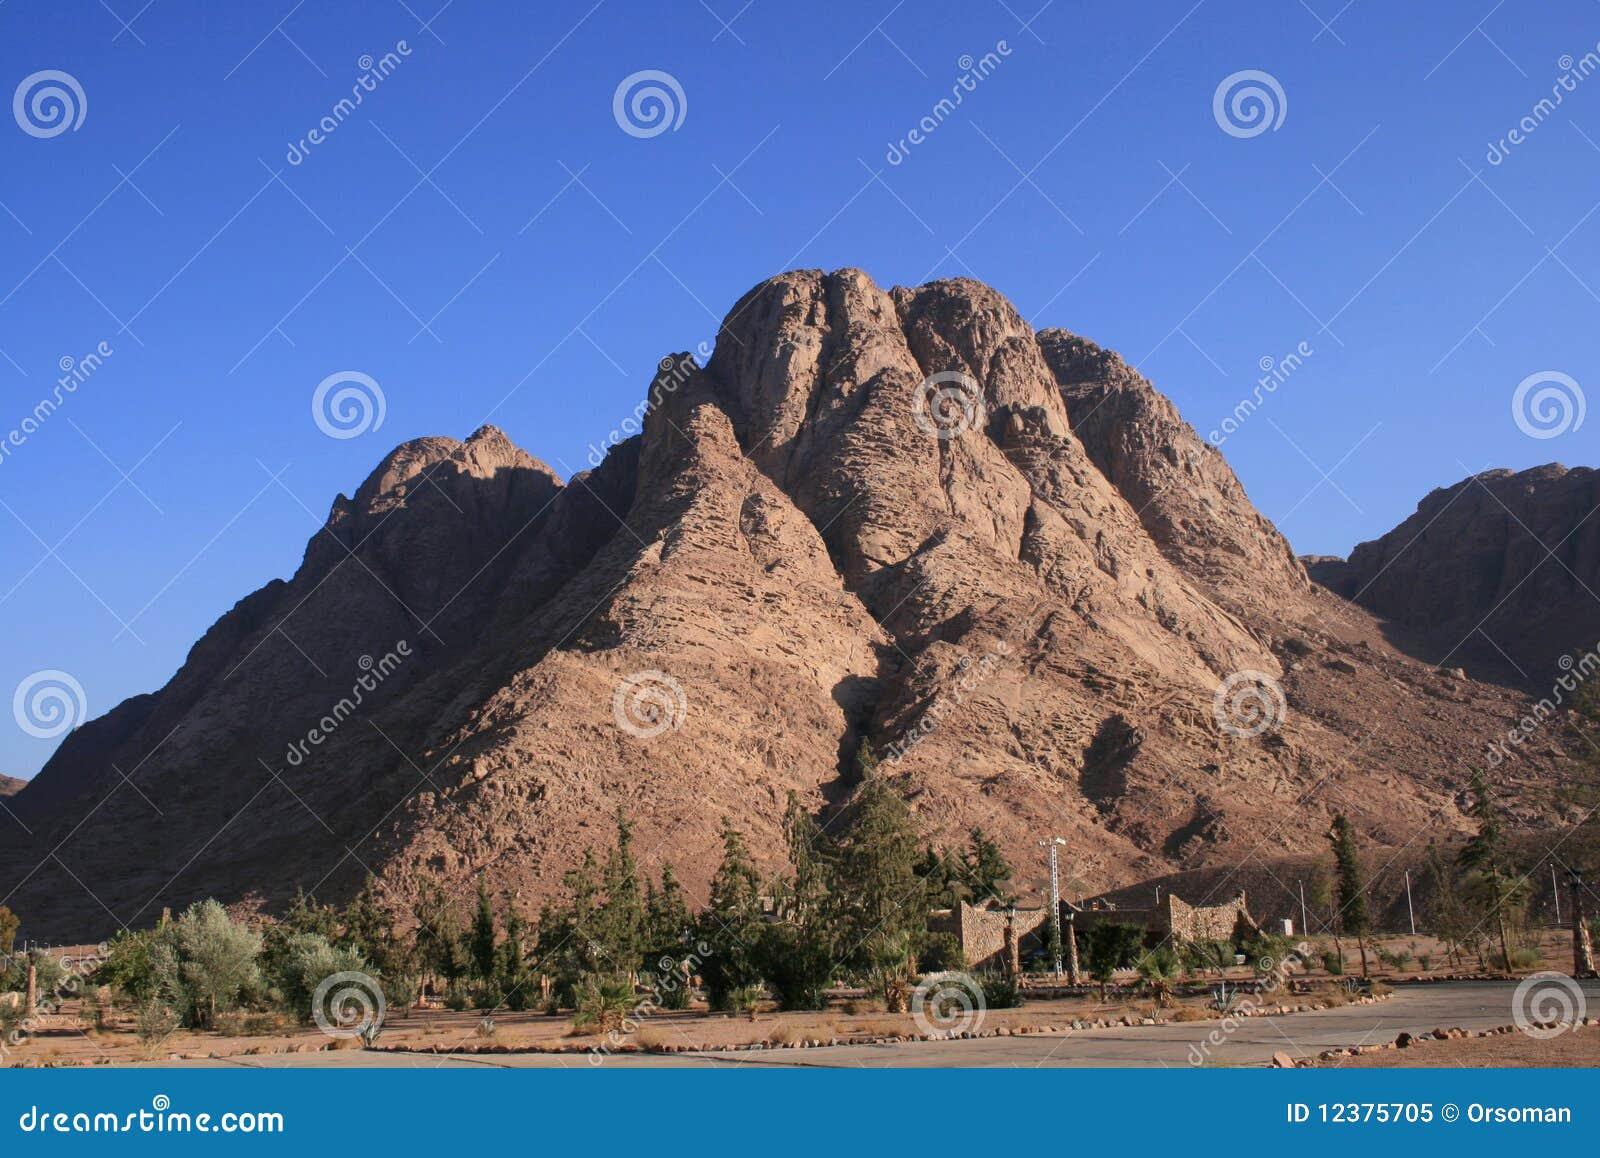 Mount Sinai Peak Royalty Free Stock Photo - Image: 12375705